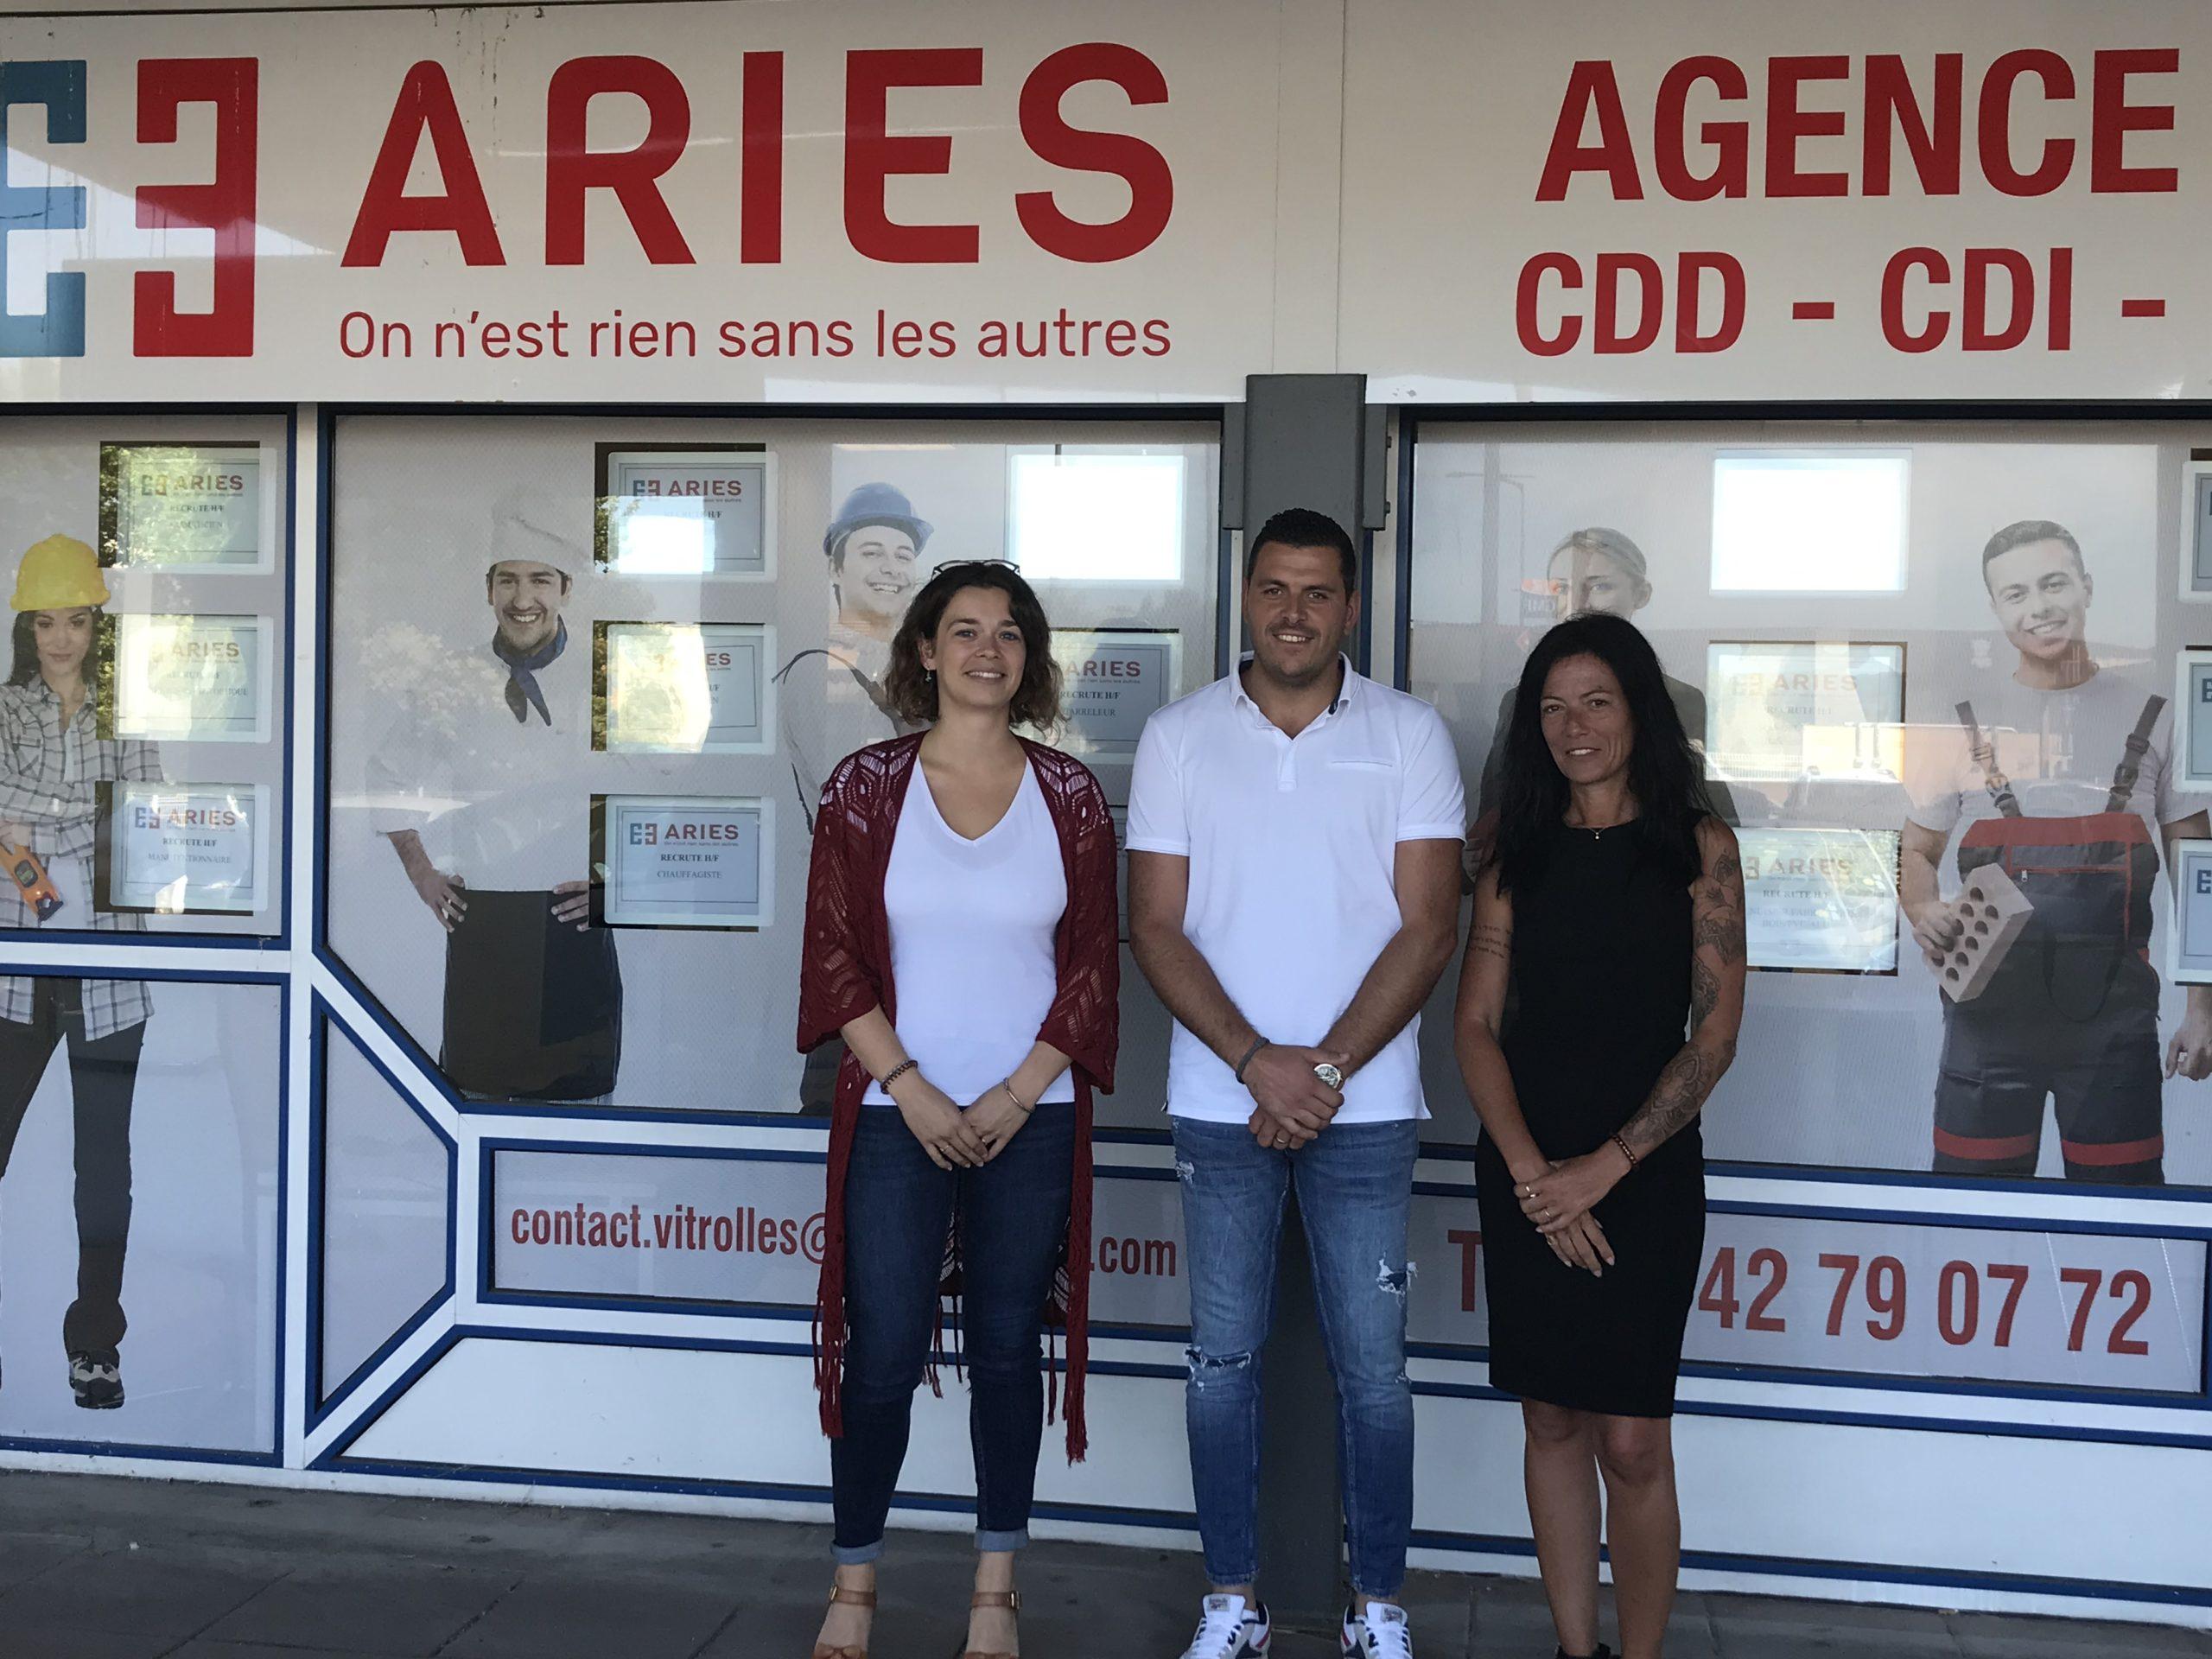 Aries intérim Vitrolles - équipes